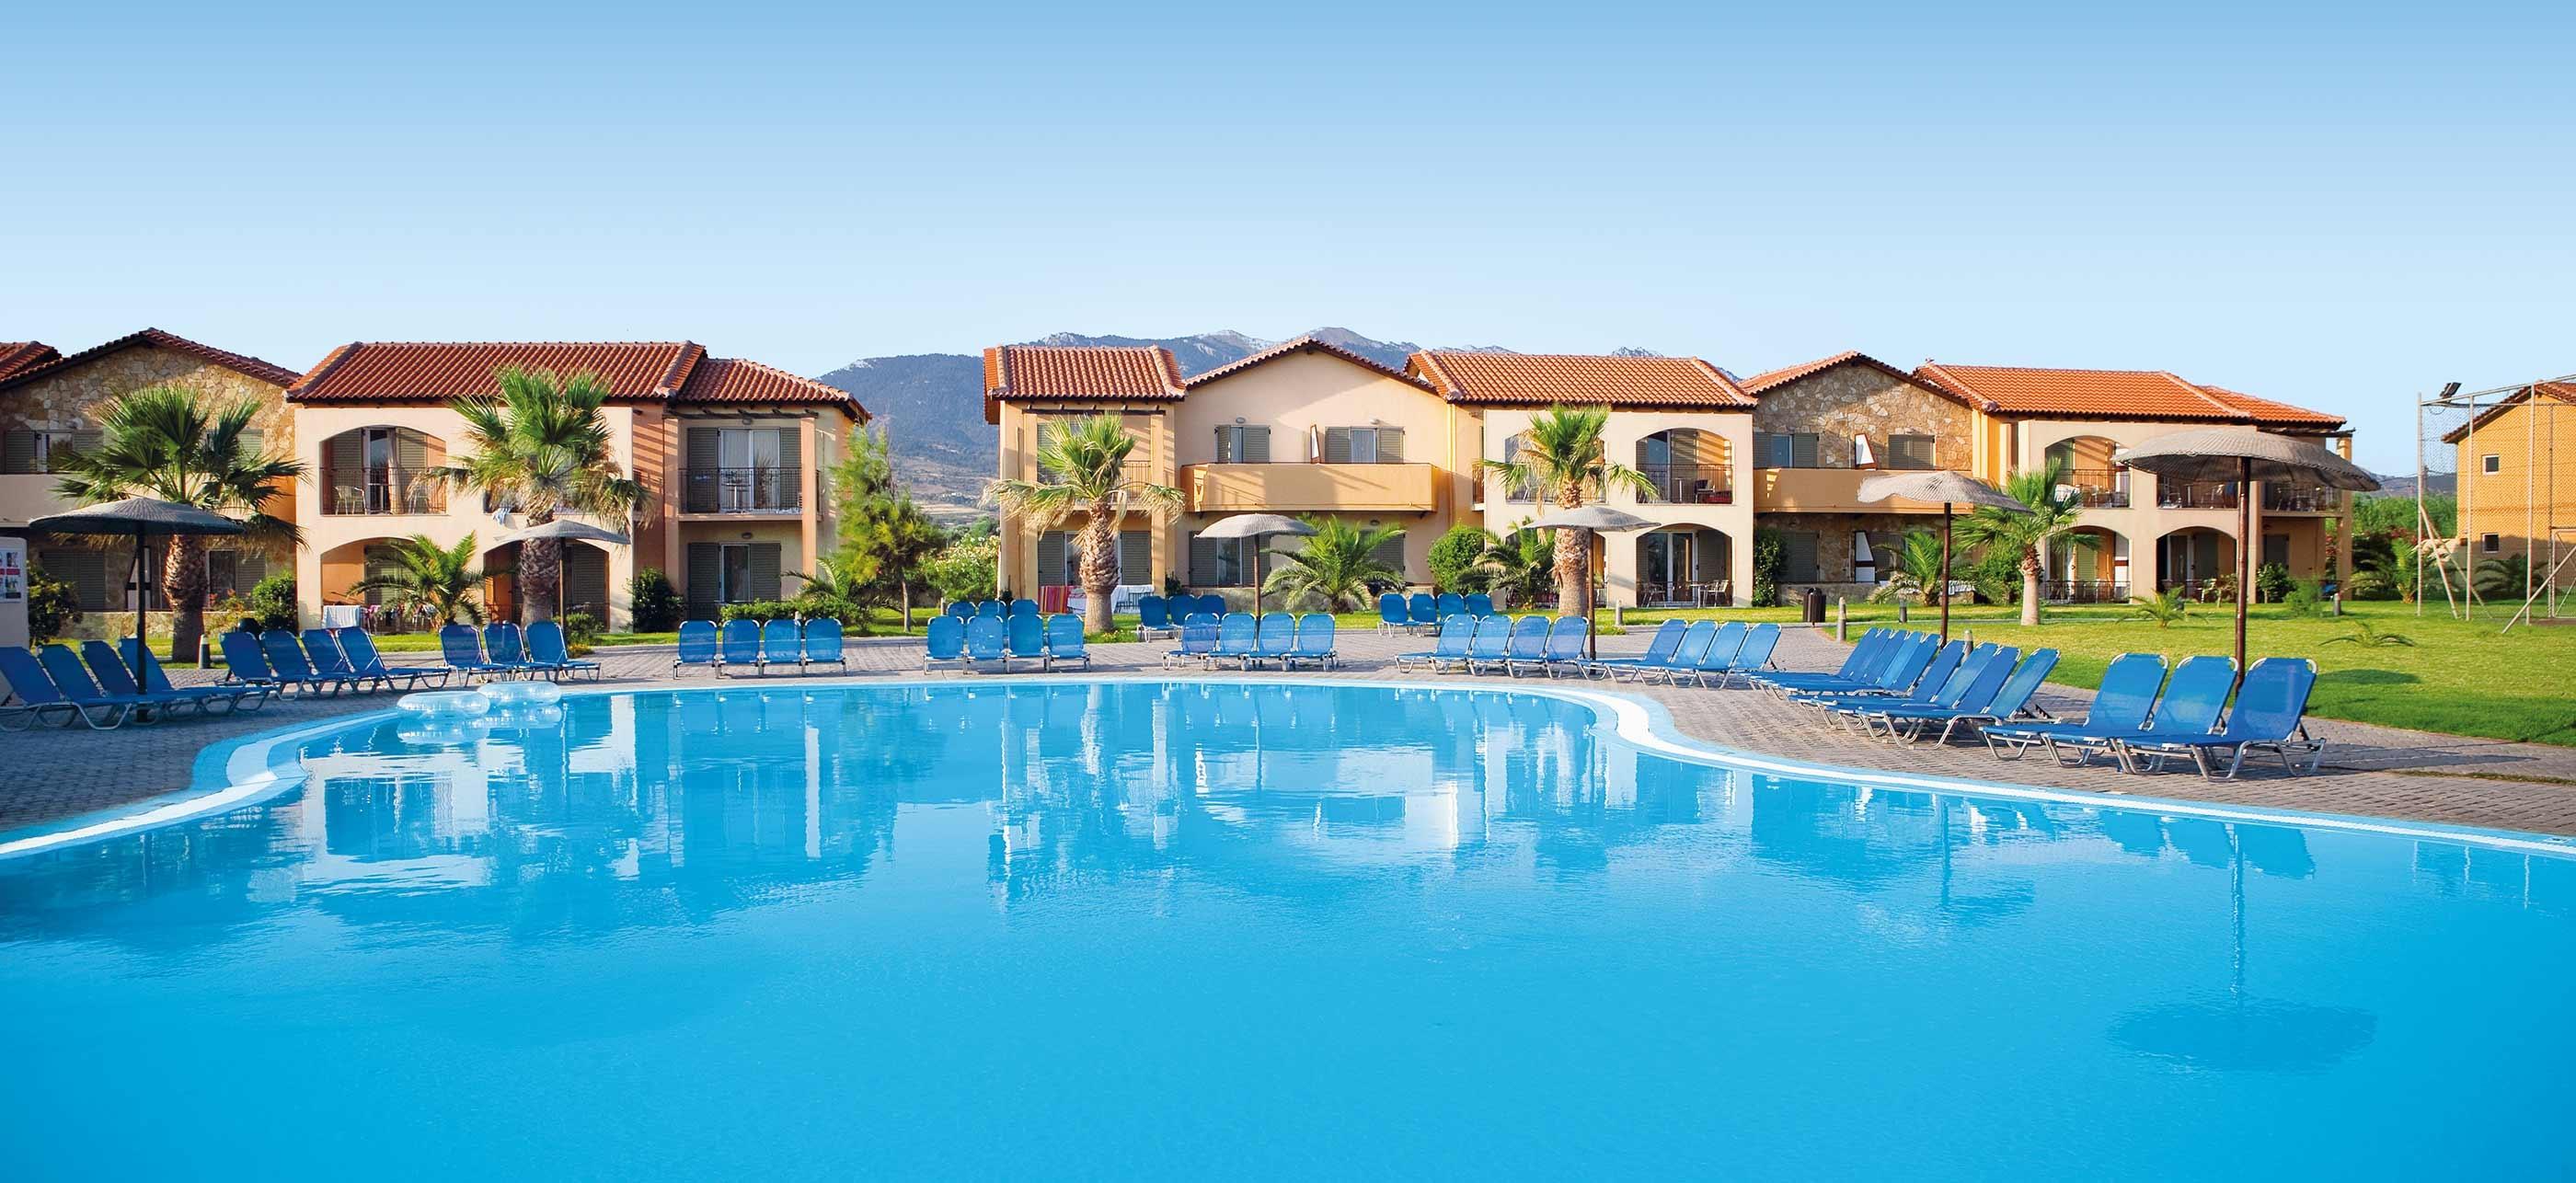 4* LABRANDA Marine Aqua Park Resort - Κως, Τιγκάκι   -37%   5 Ημέρες (4 Διανυκτερεύσεις)   2 Άτομα ΚΑΙ ένα Παιδί έως 12 ετών   All Inclusive   11/06 έως 11/07 και 29/08 έως 20/09   <strong>Επιπλέον 1 Διανυκτέρευση ΔΩΡΟ και 10% €πιστροφή Eurobank</strong>